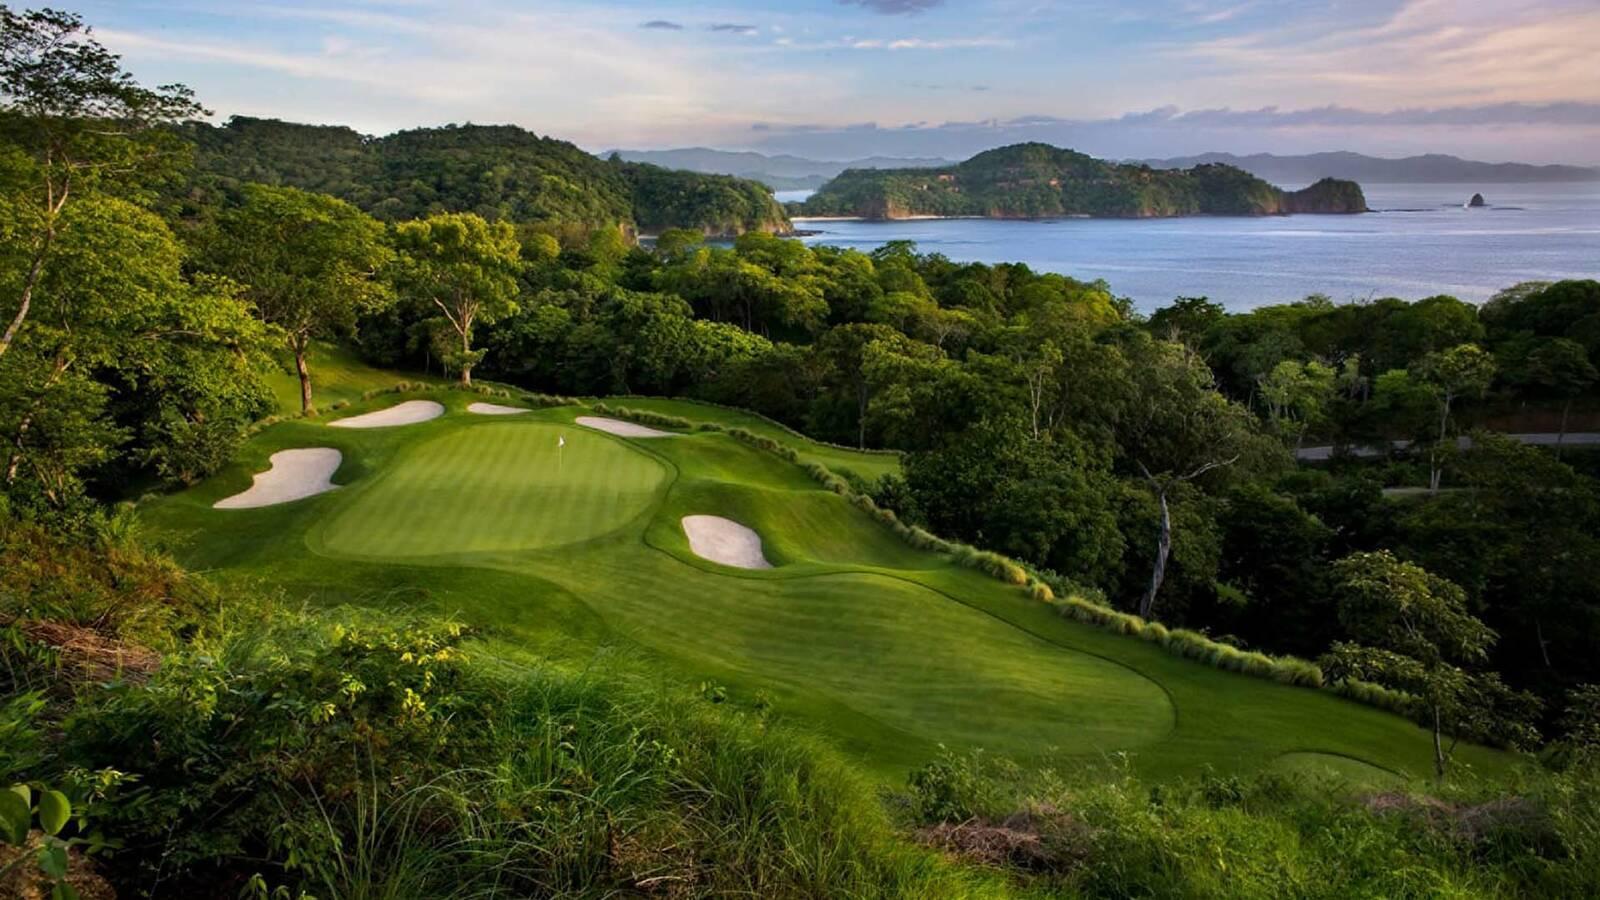 Costa Rica Four Seasons Papagayo parcours golf